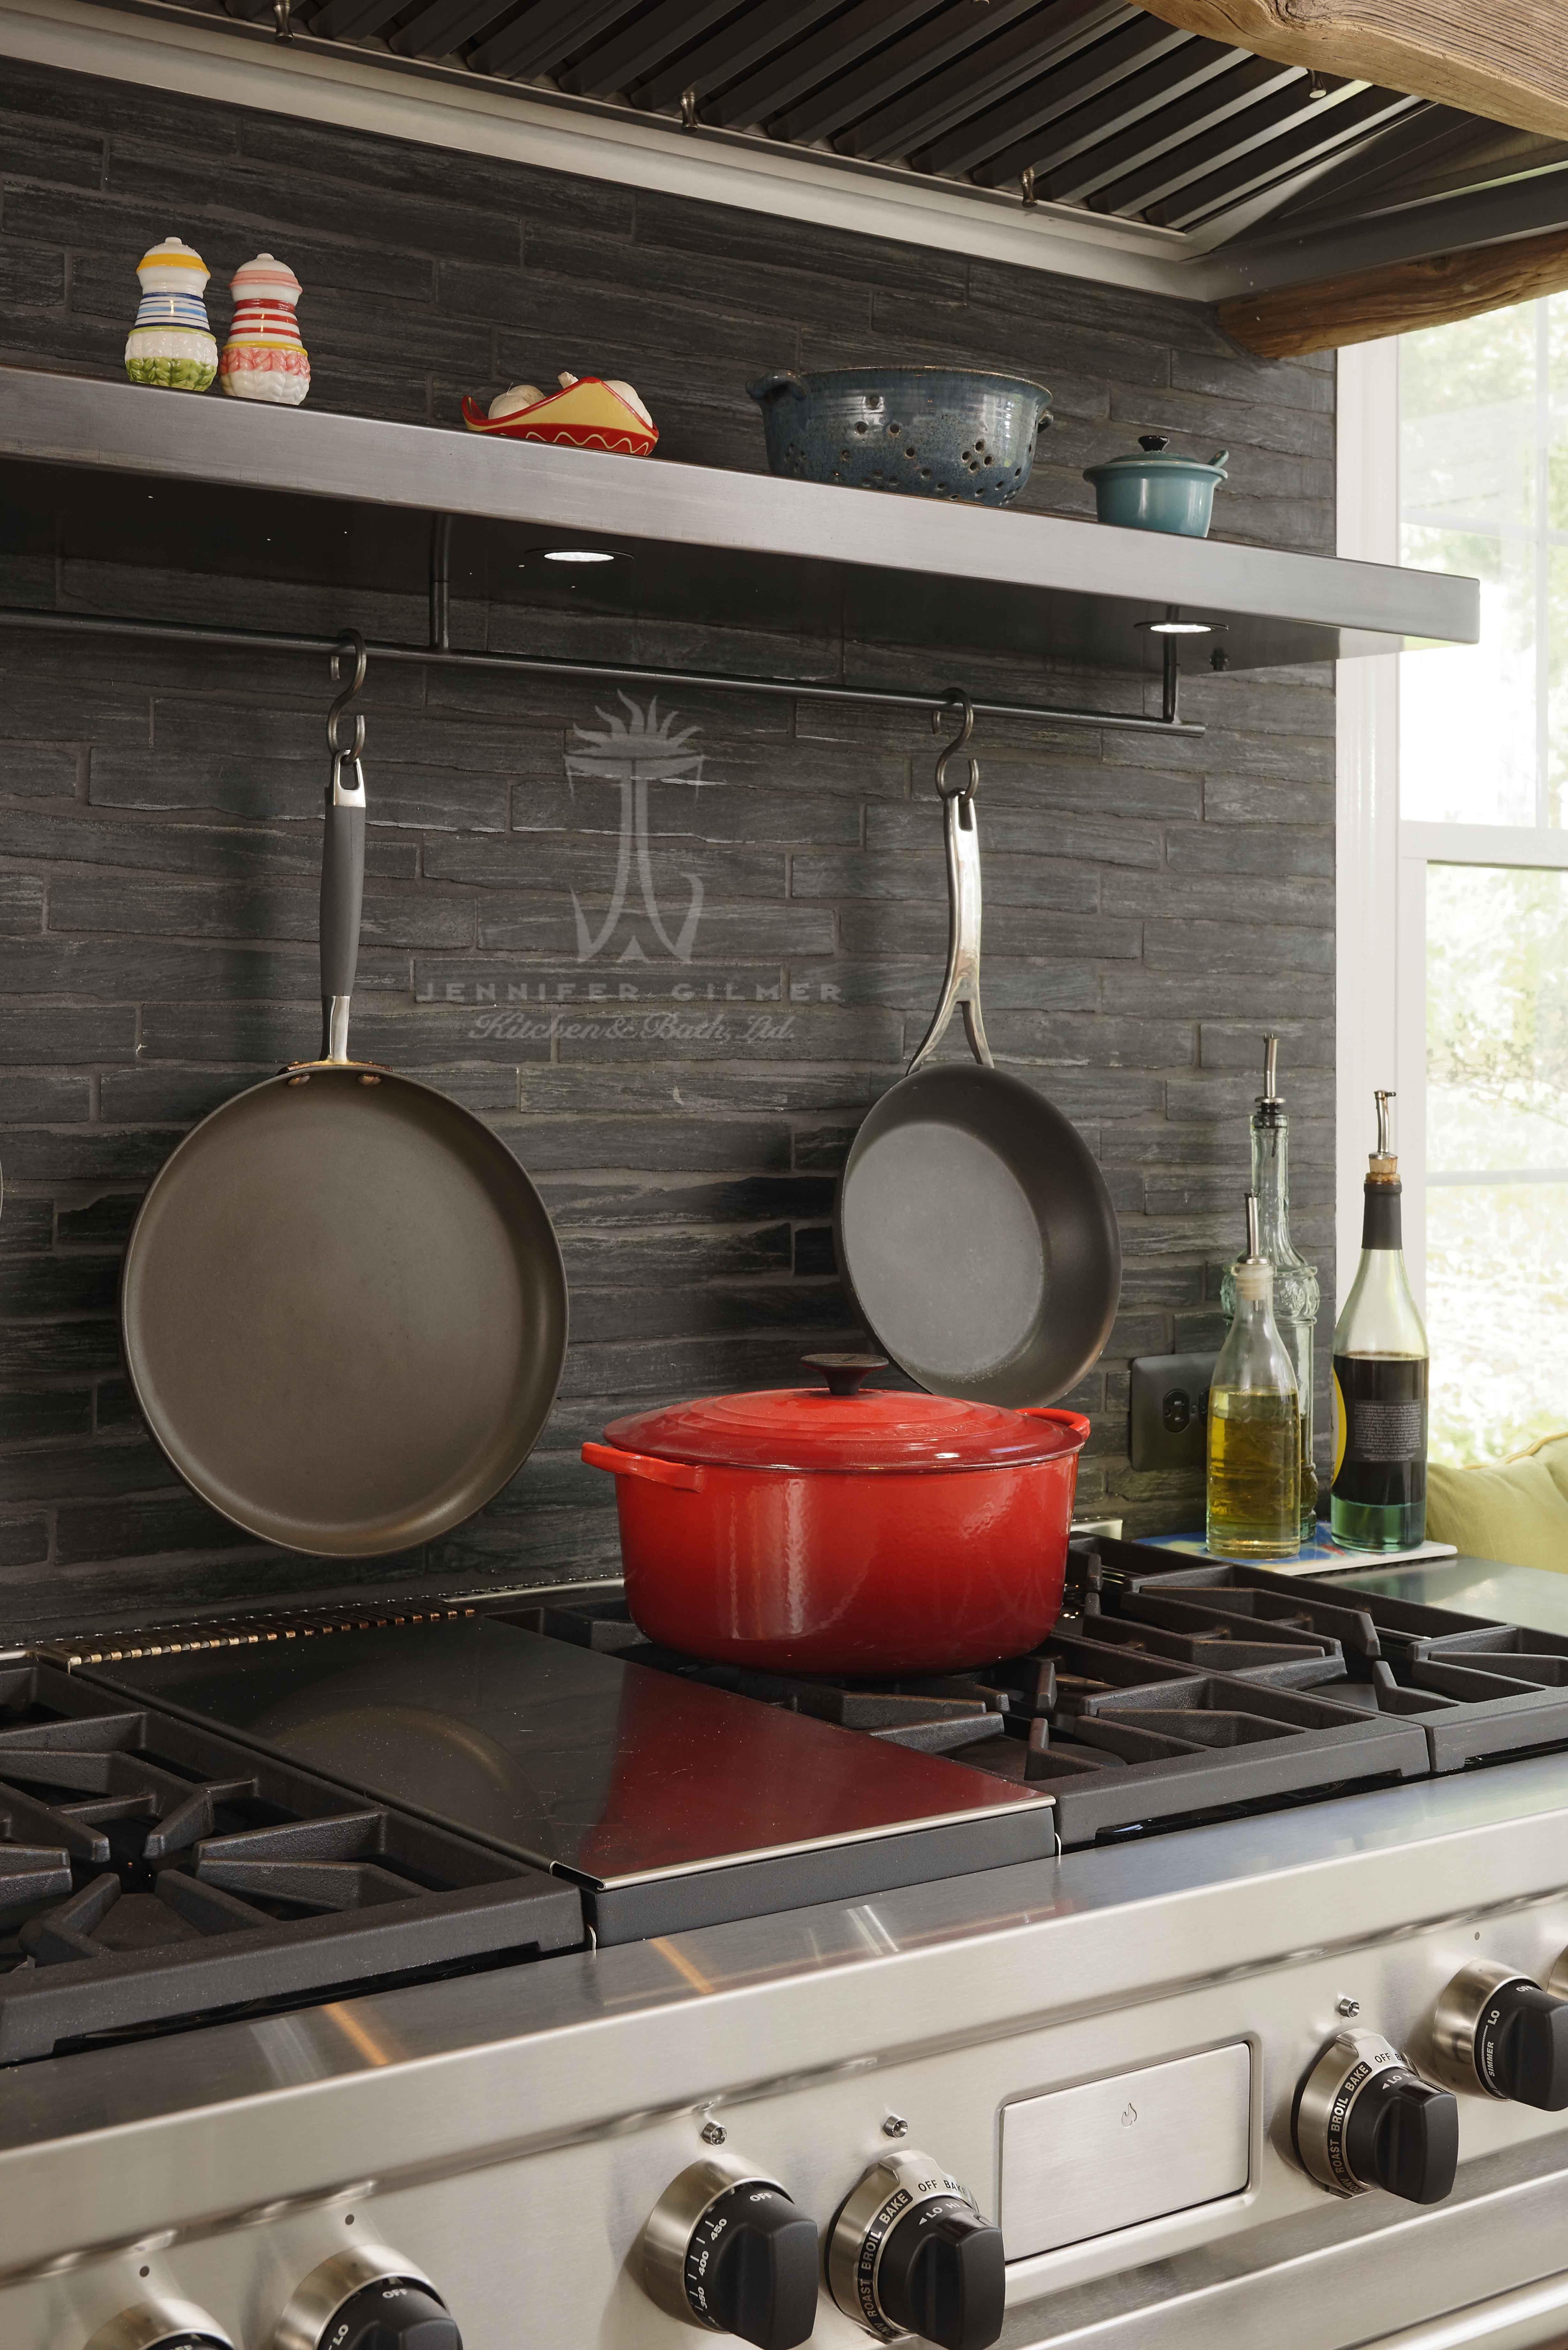 Kitchen Design By Sarahturner4jennifergilmer Includes Wolf Gr486g 48 Dual Fuel Pro Range And